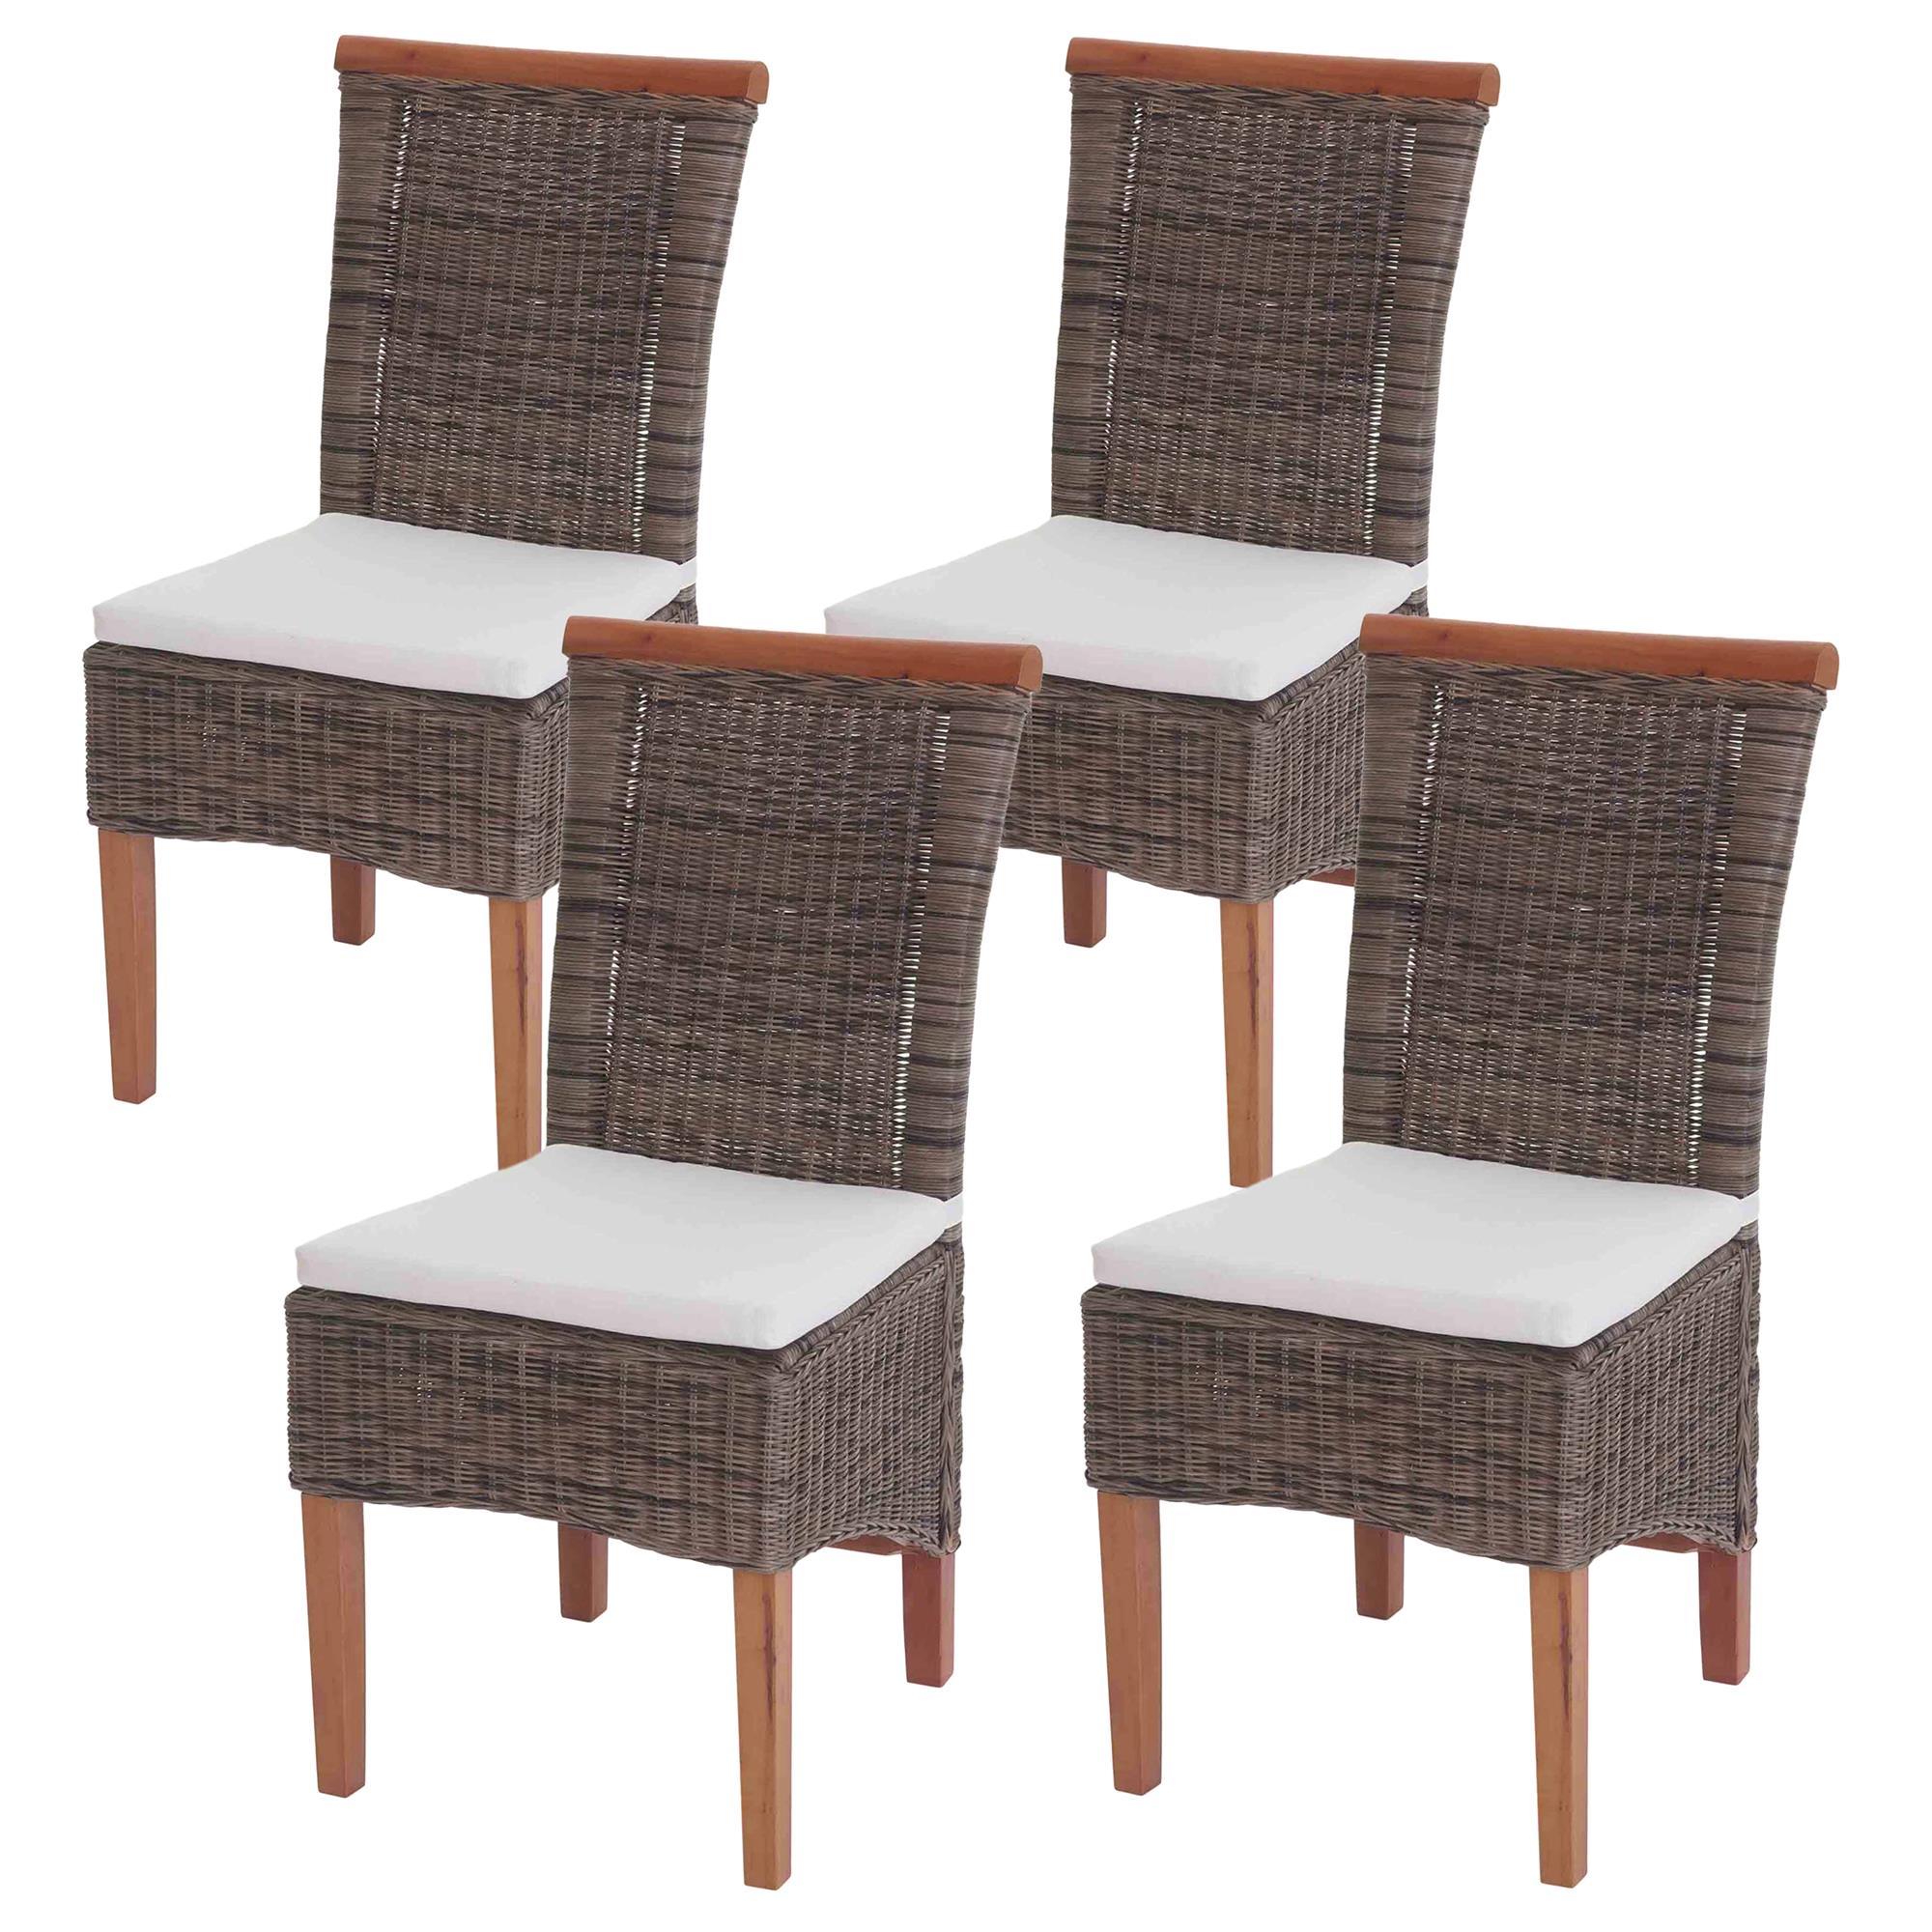 Lote 4 sillas comedor o jardin sedri en mimbre marr n for Sillas mimbre comedor